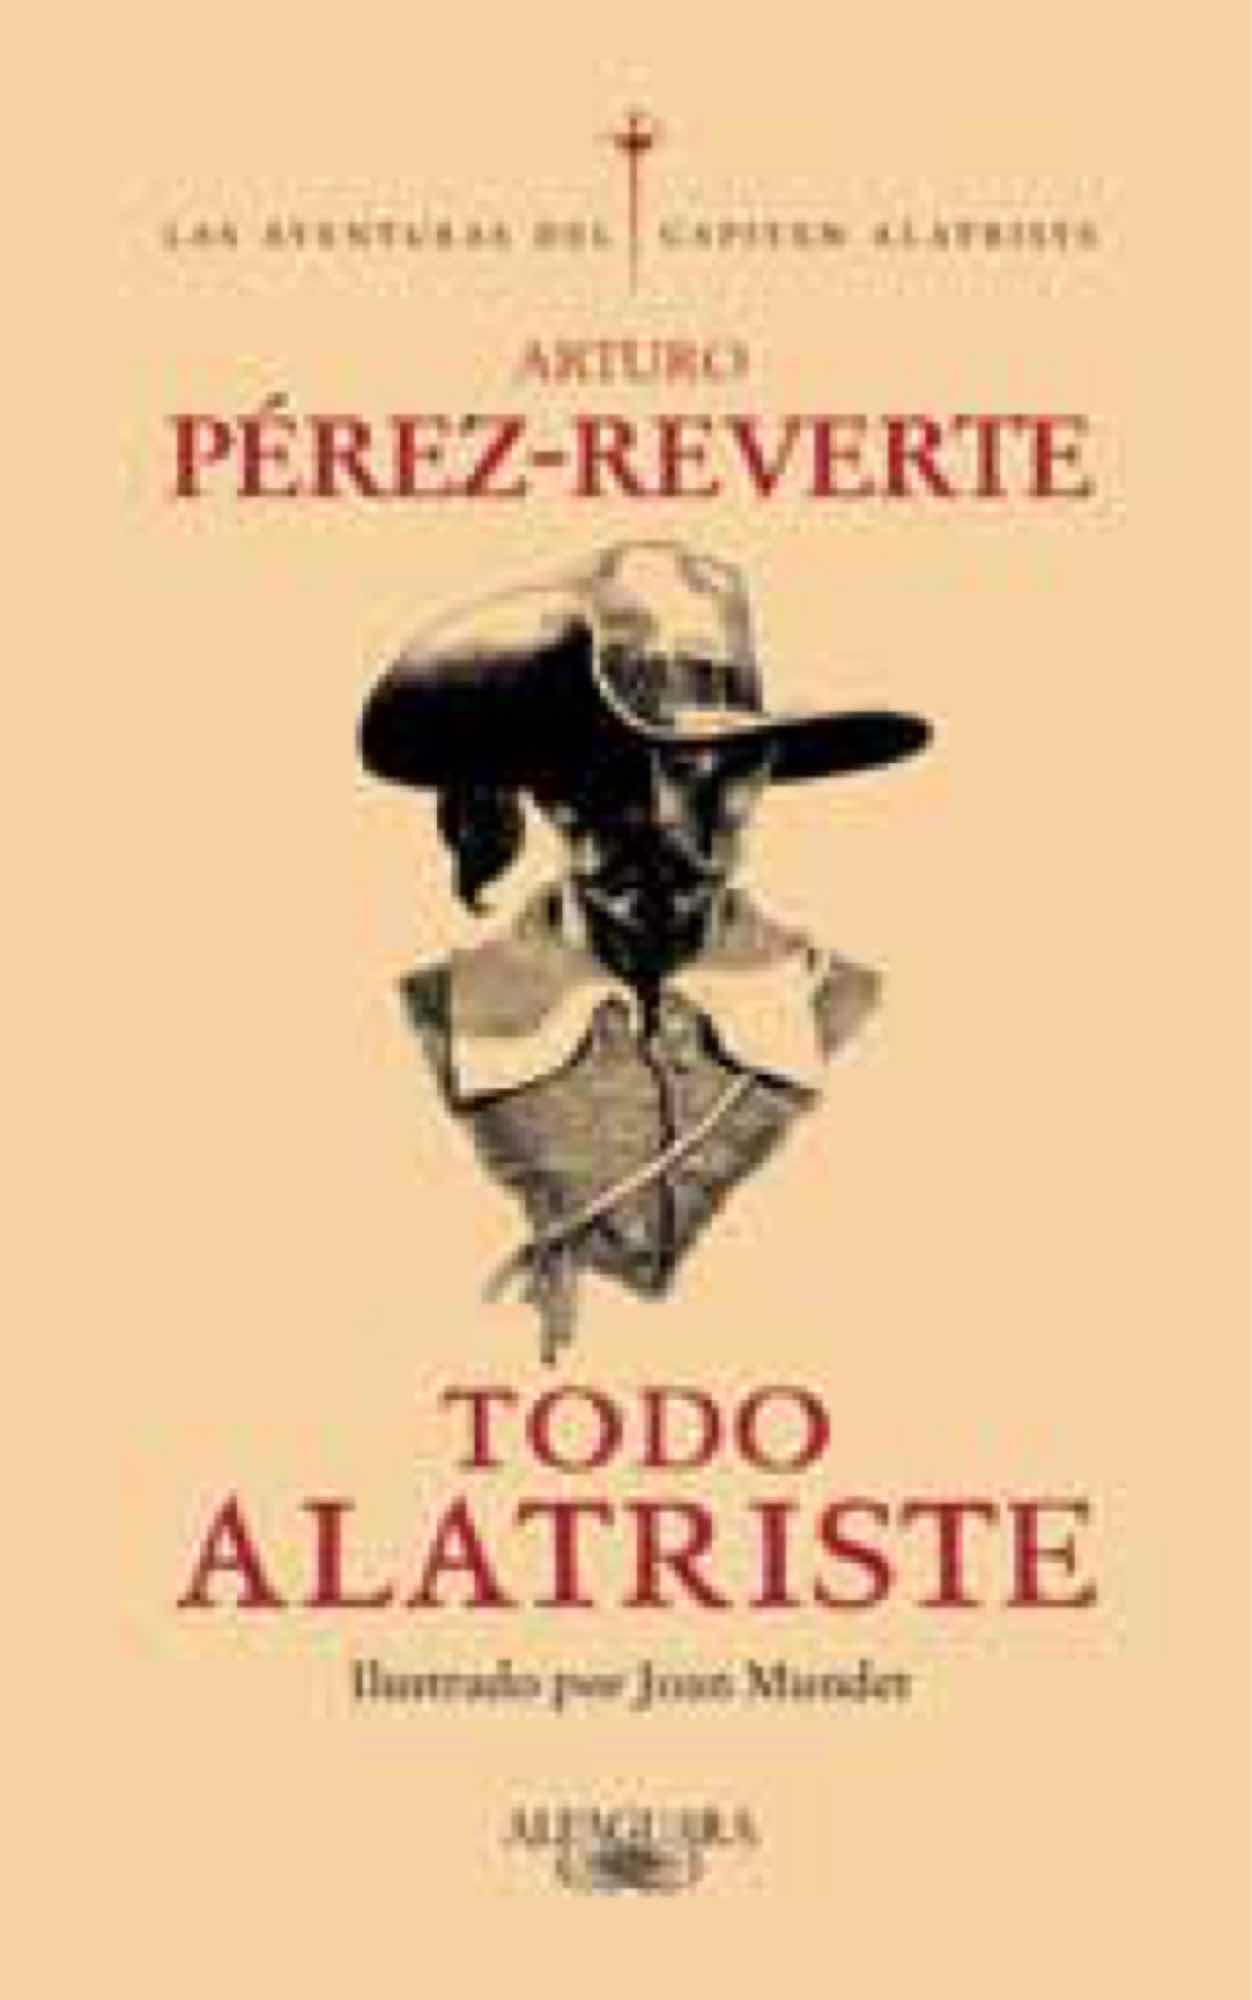 TODO ALATRISTE (EDICION ESPECIAL)